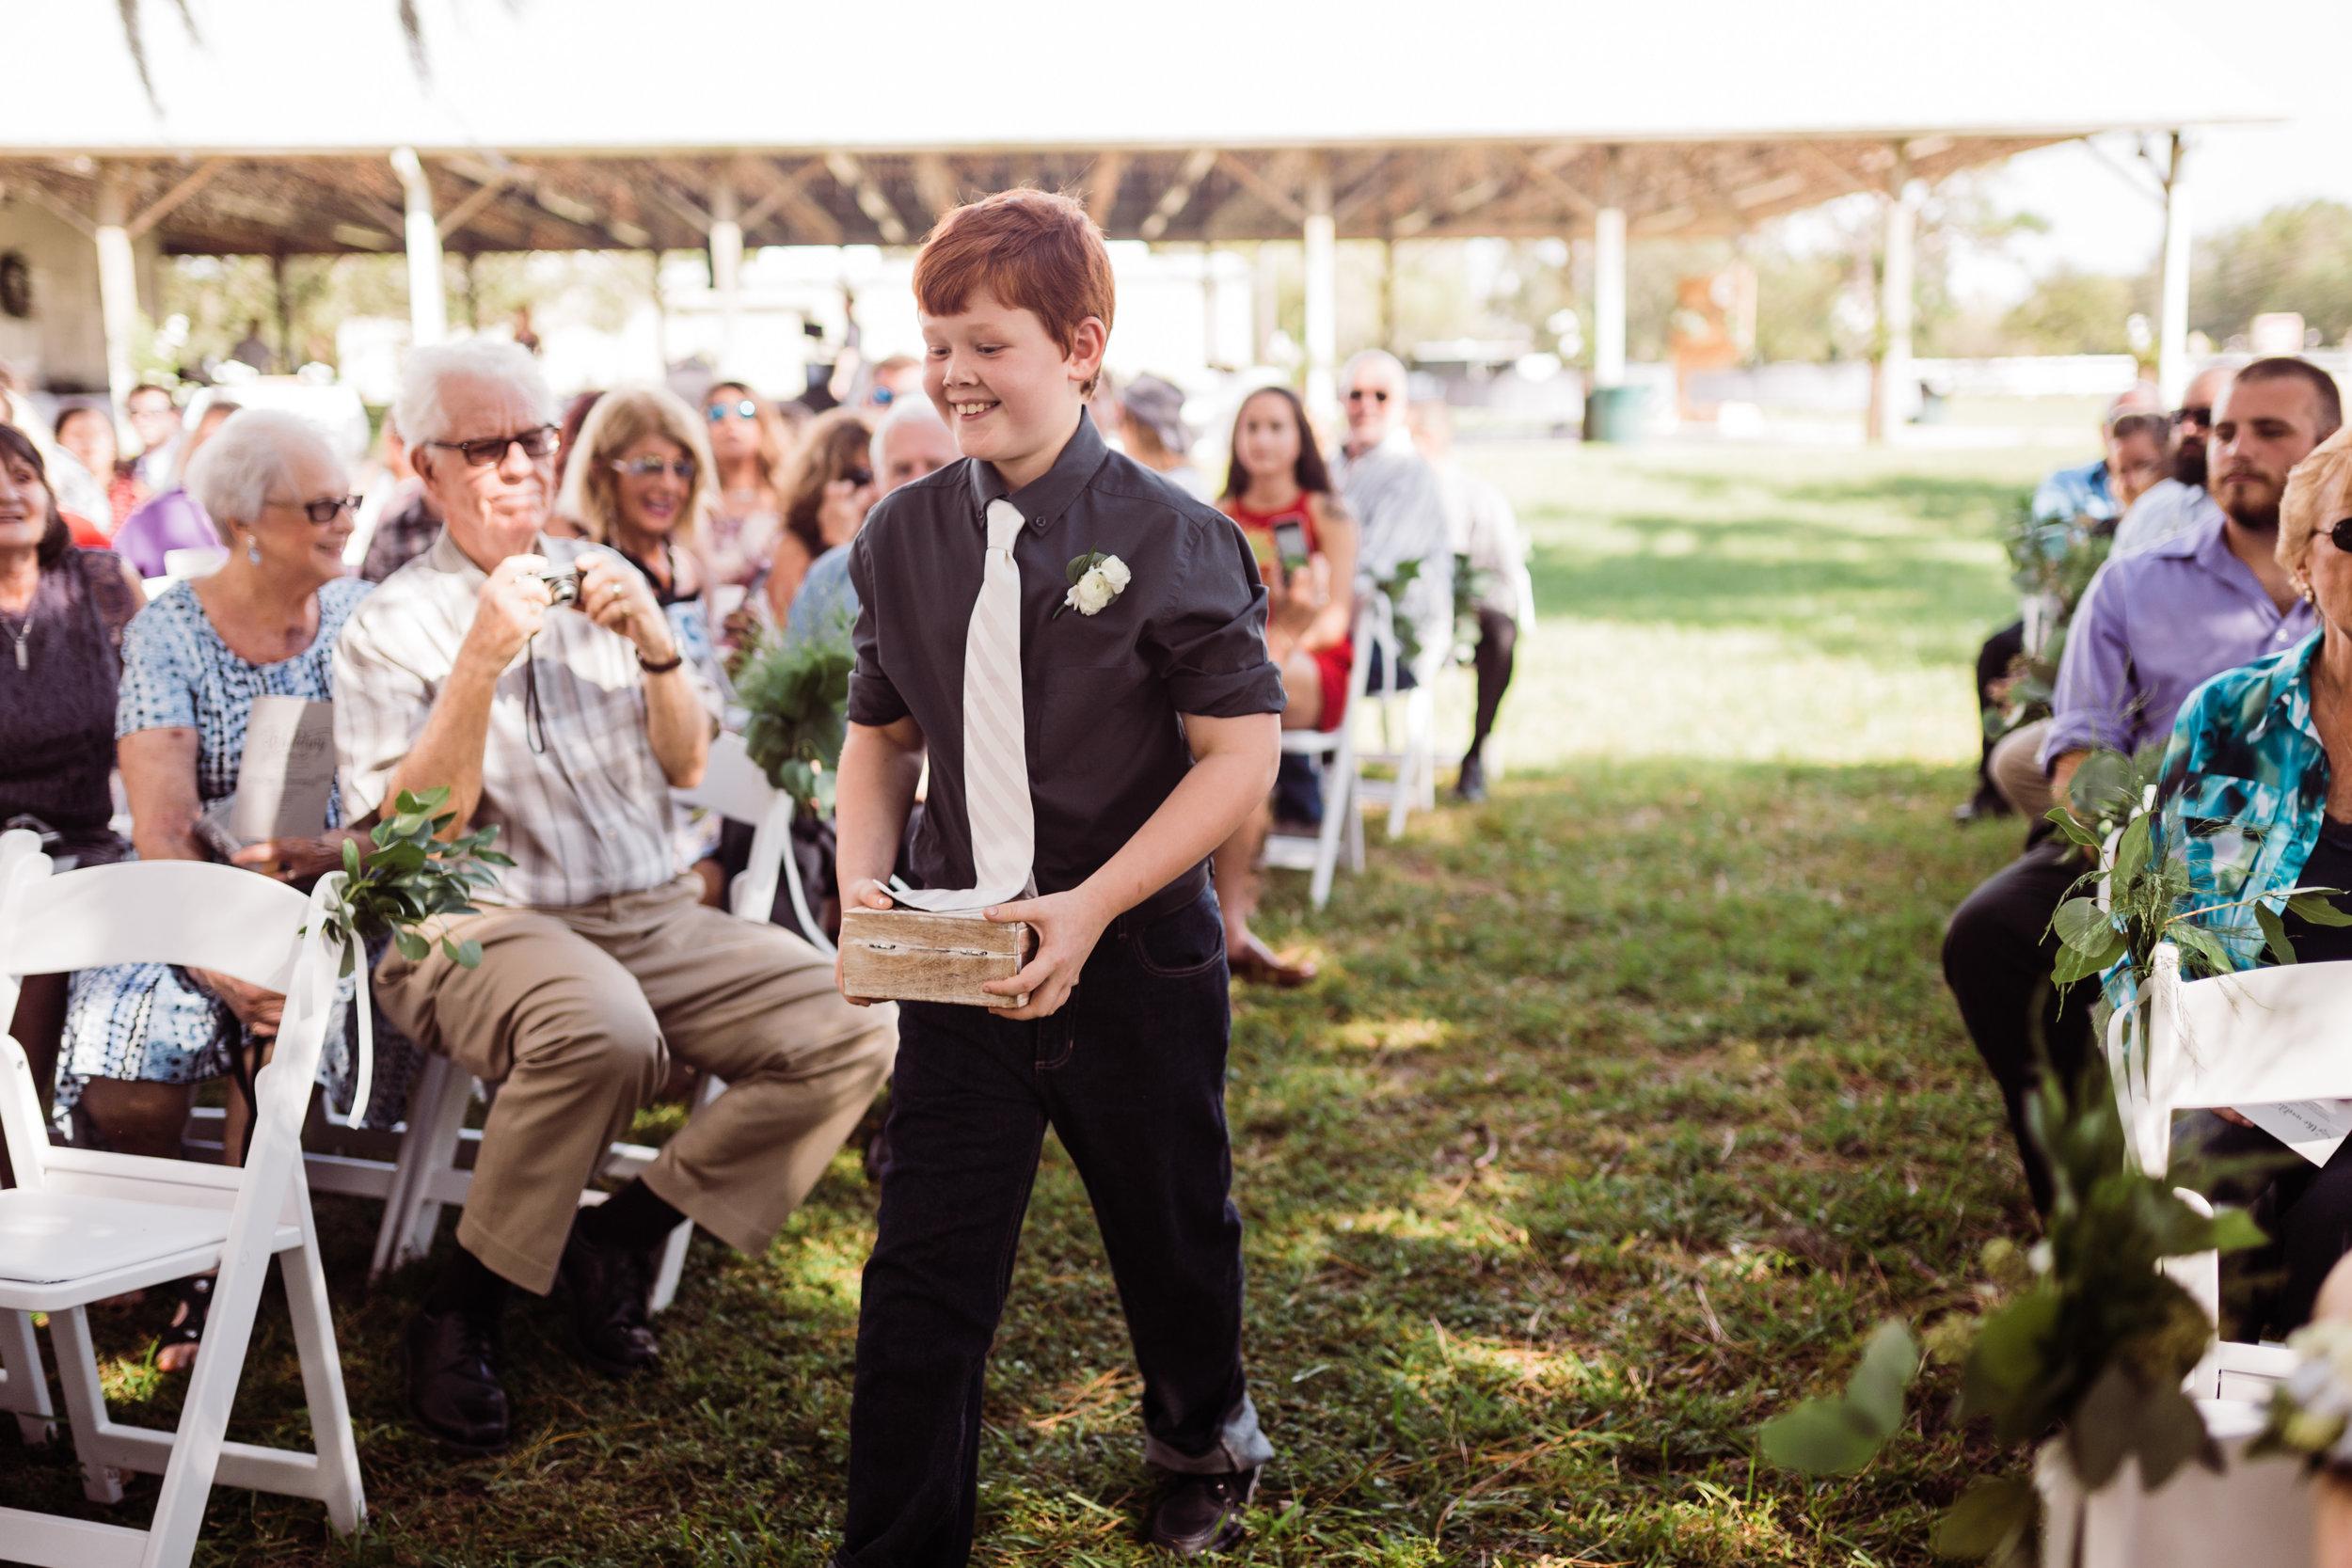 2017.10.14 Samantha and Matthew Crabtree Sarasota Wedding (117 of 708).jpg